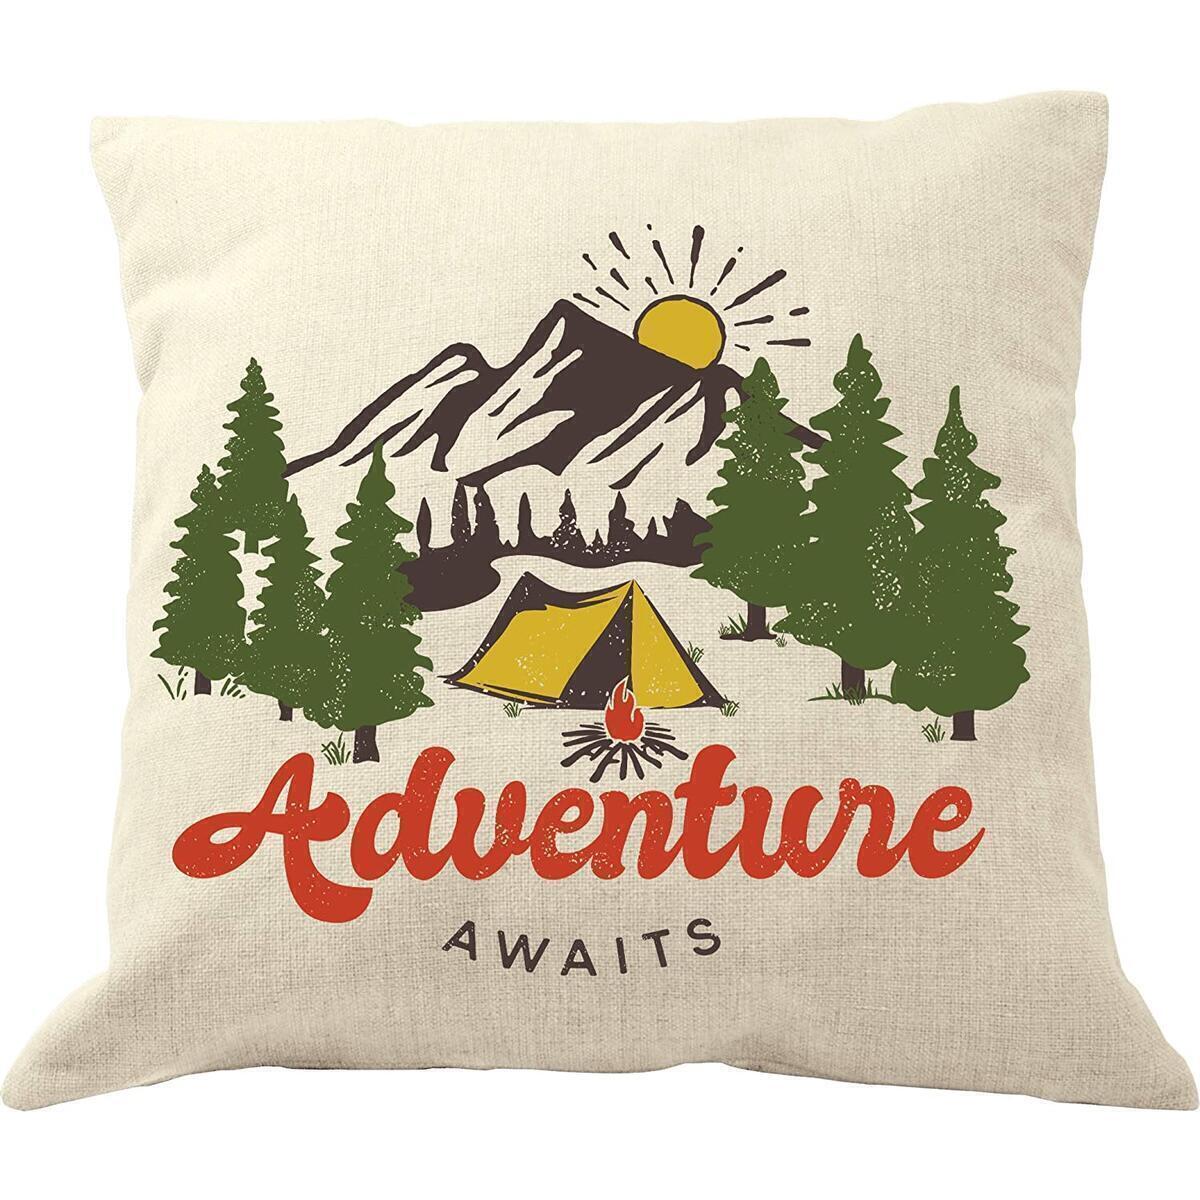 DrupsCo Adventure Awaits Pillow Cover - 18 x 18 Adventure Throw Pillow - Adventure Decor Throw Pillow Cover